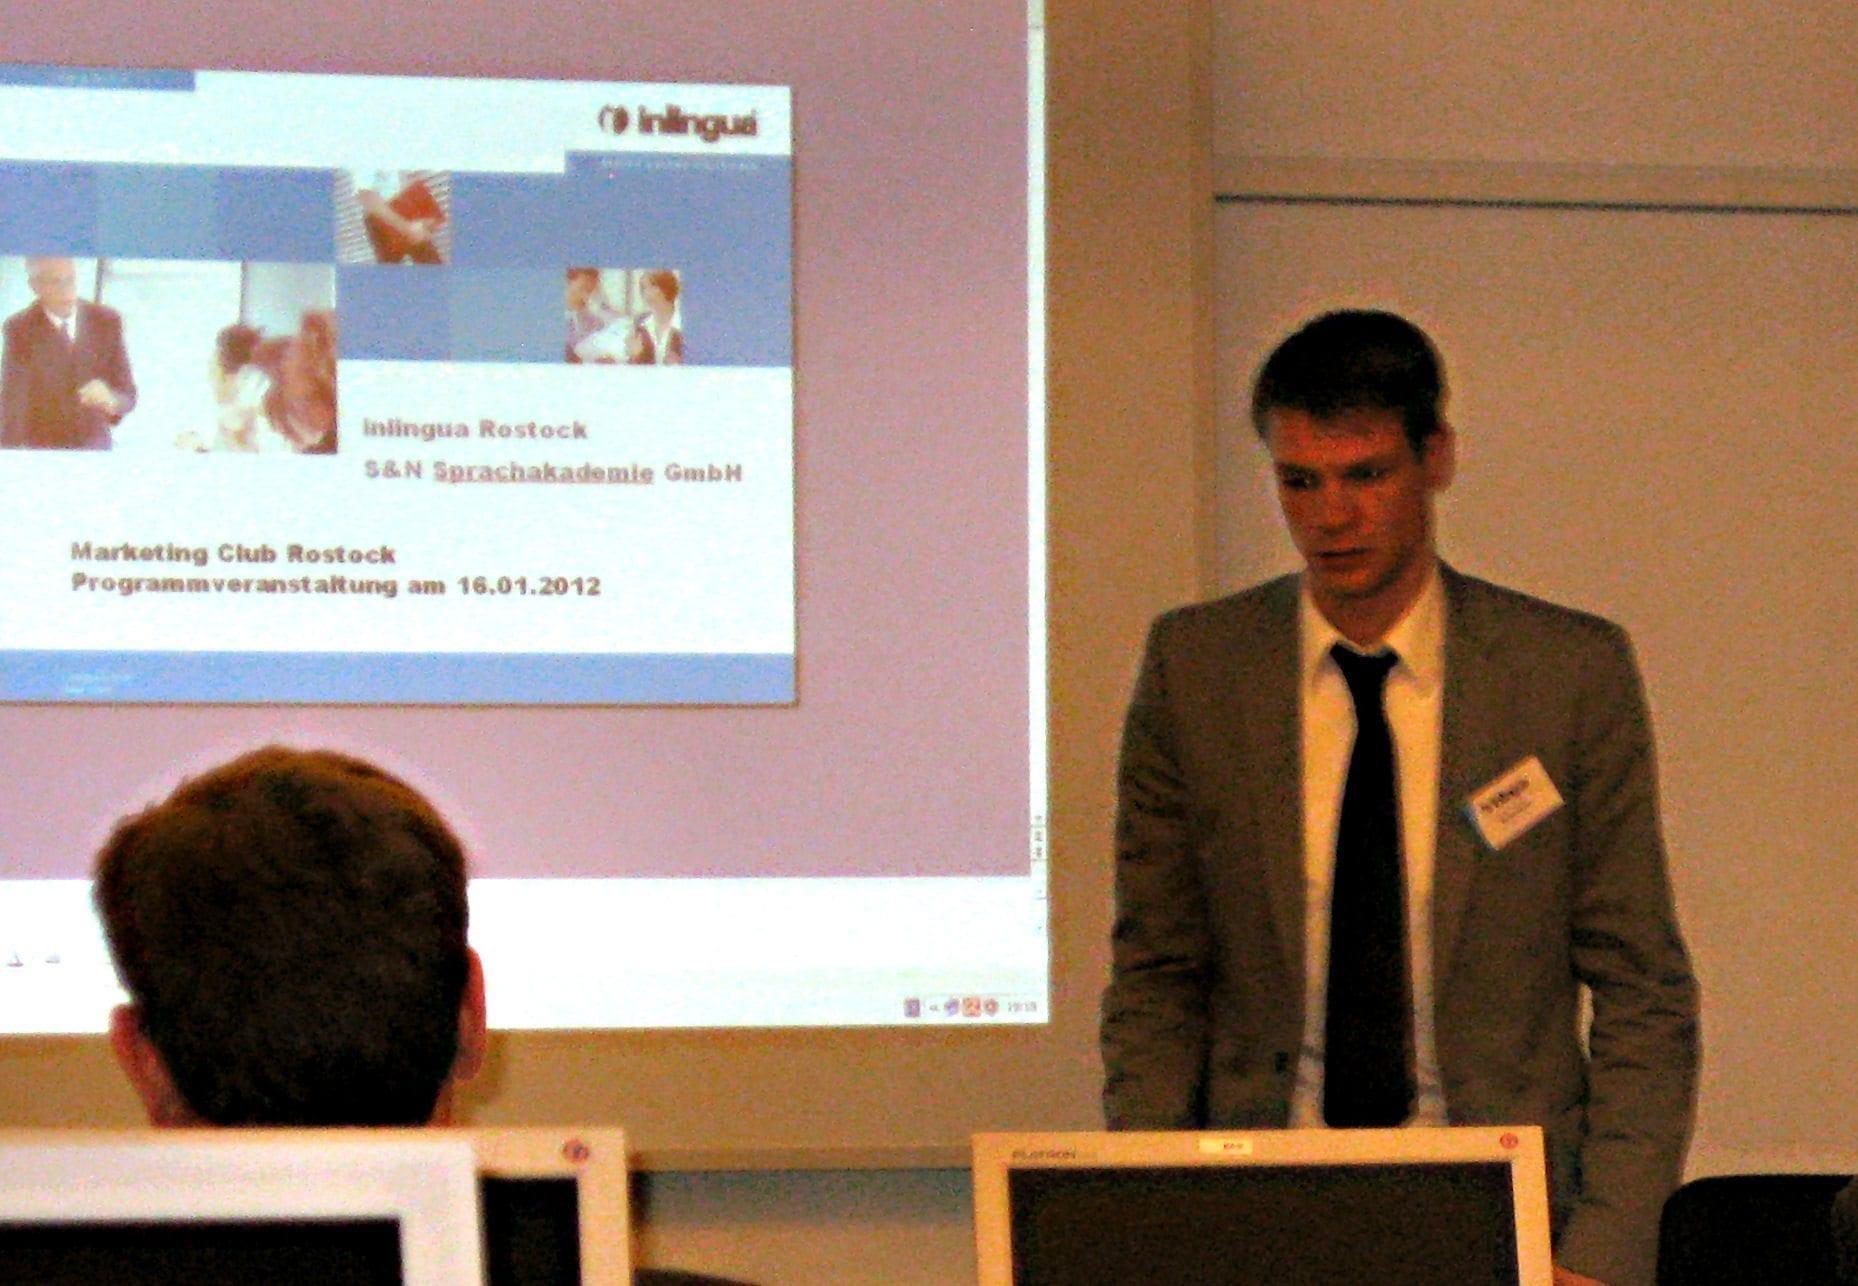 16.01.2012 / inlingua Rostock